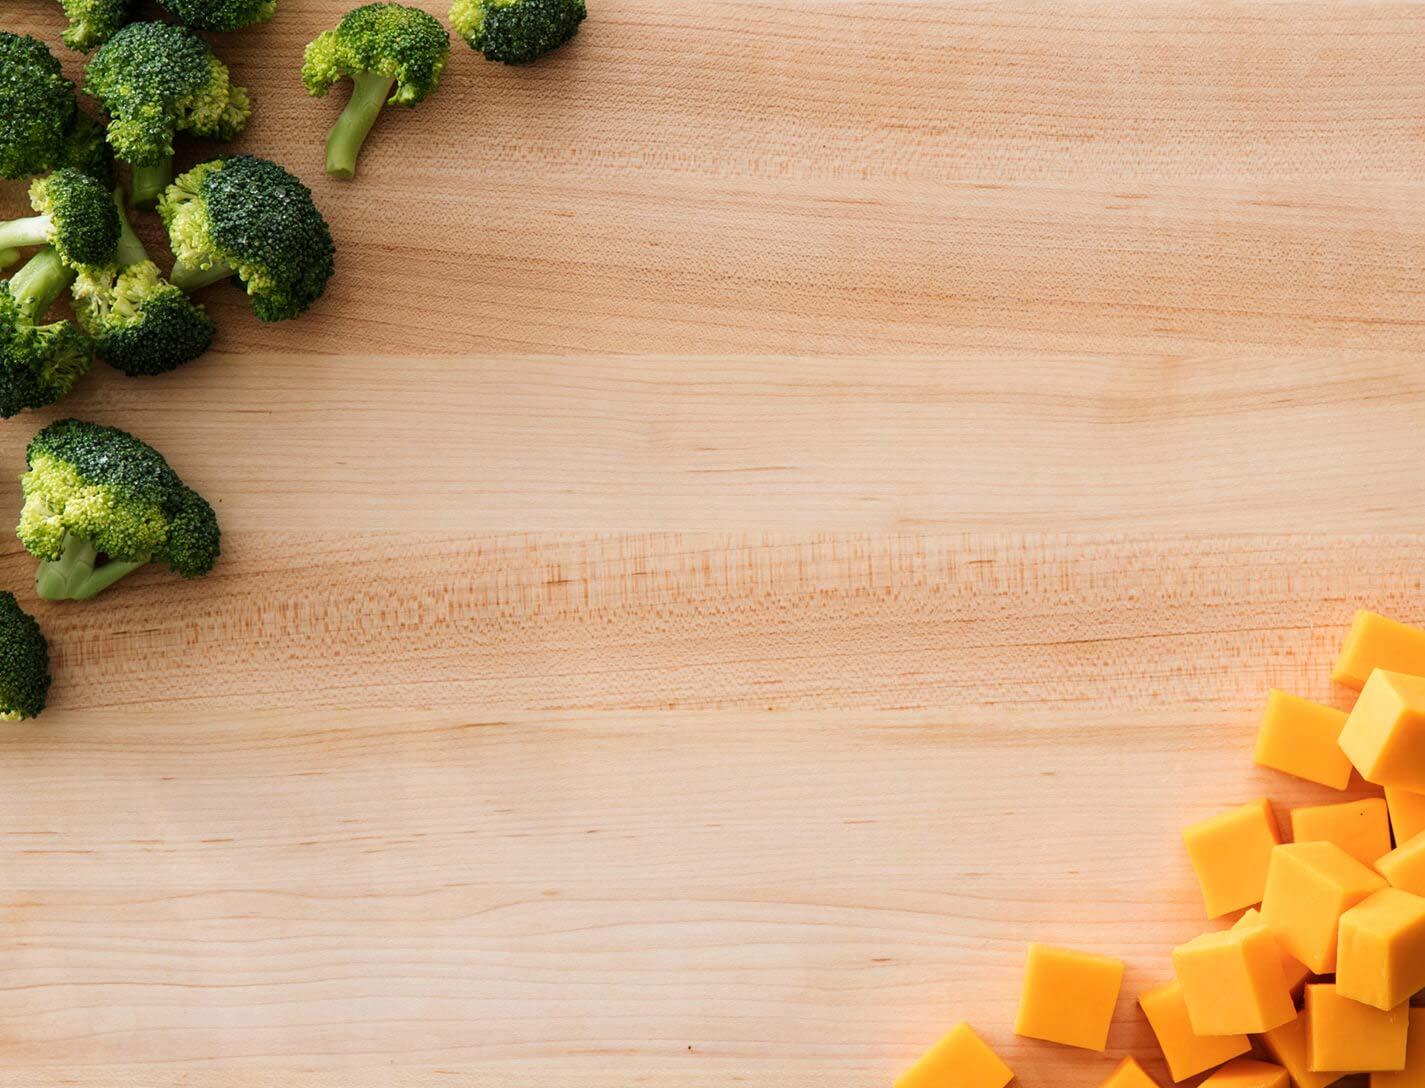 Bob Evans Homestyle Broccoli & Cheese